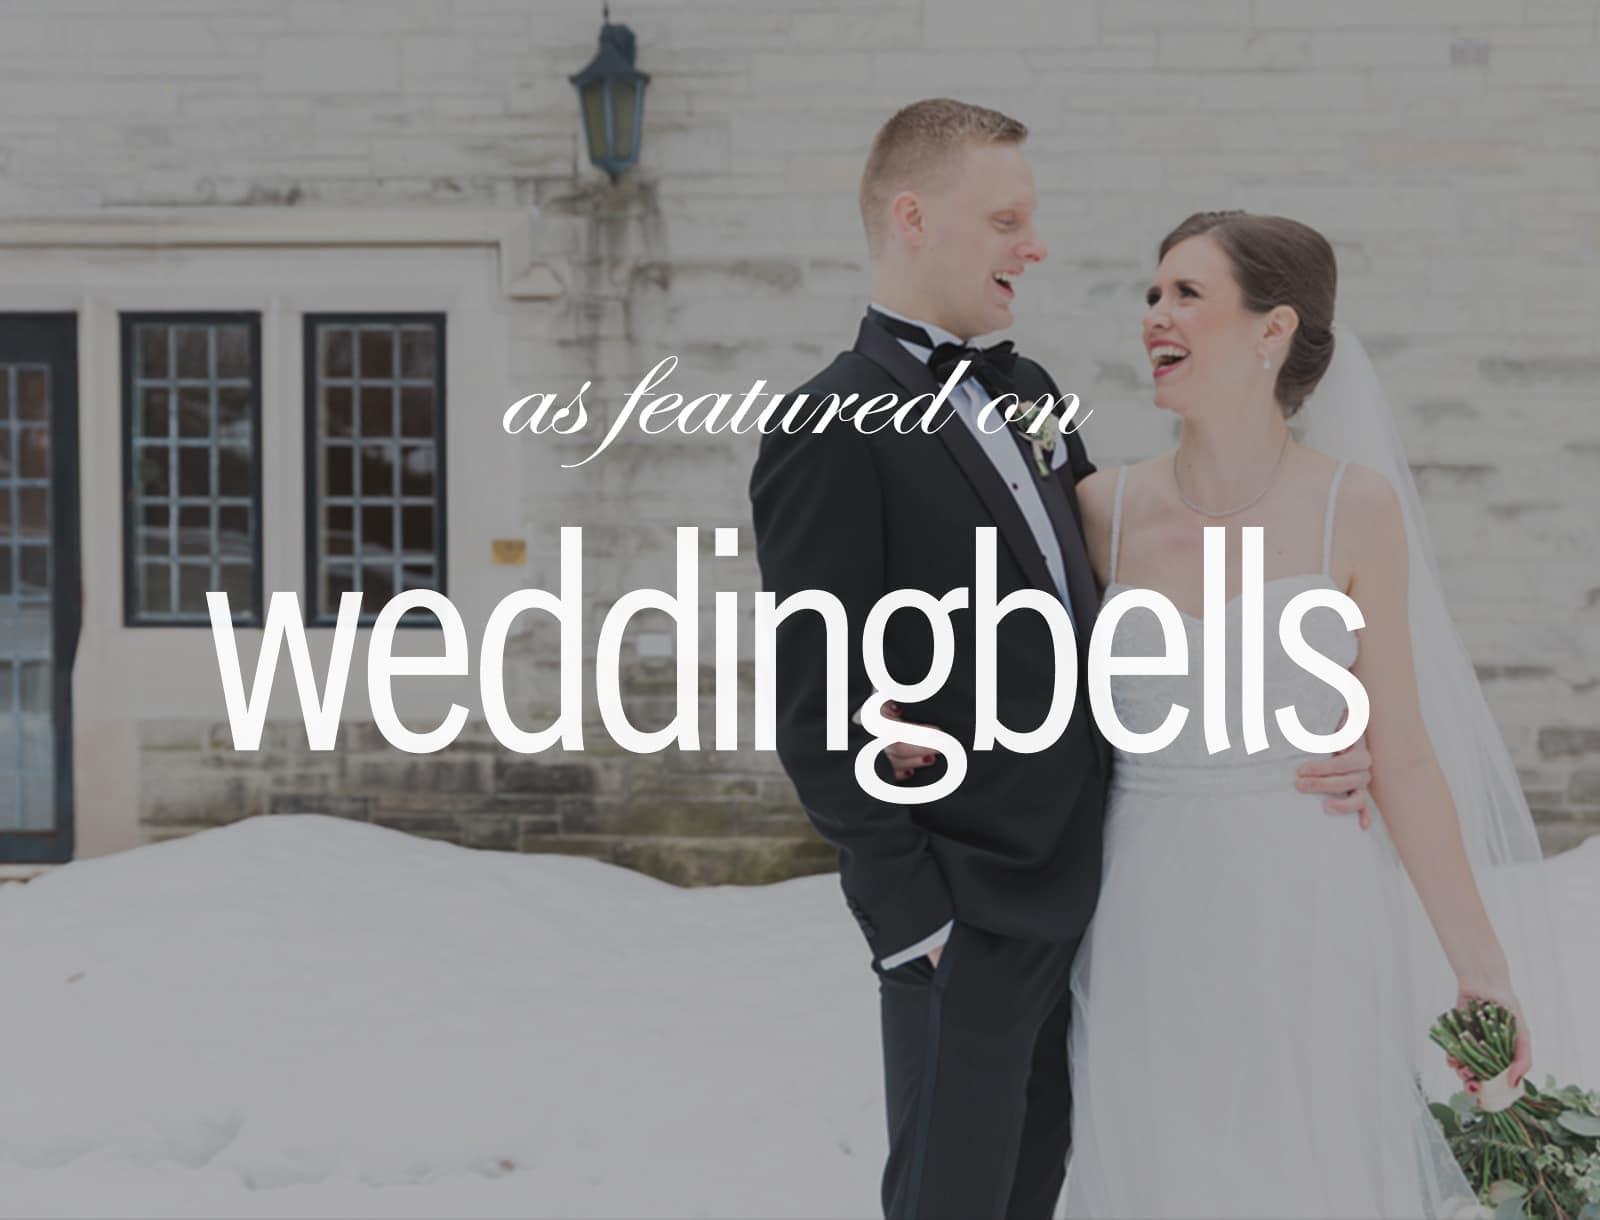 Featured on Weddingbells: Art Deco New Year's Eve Wedding